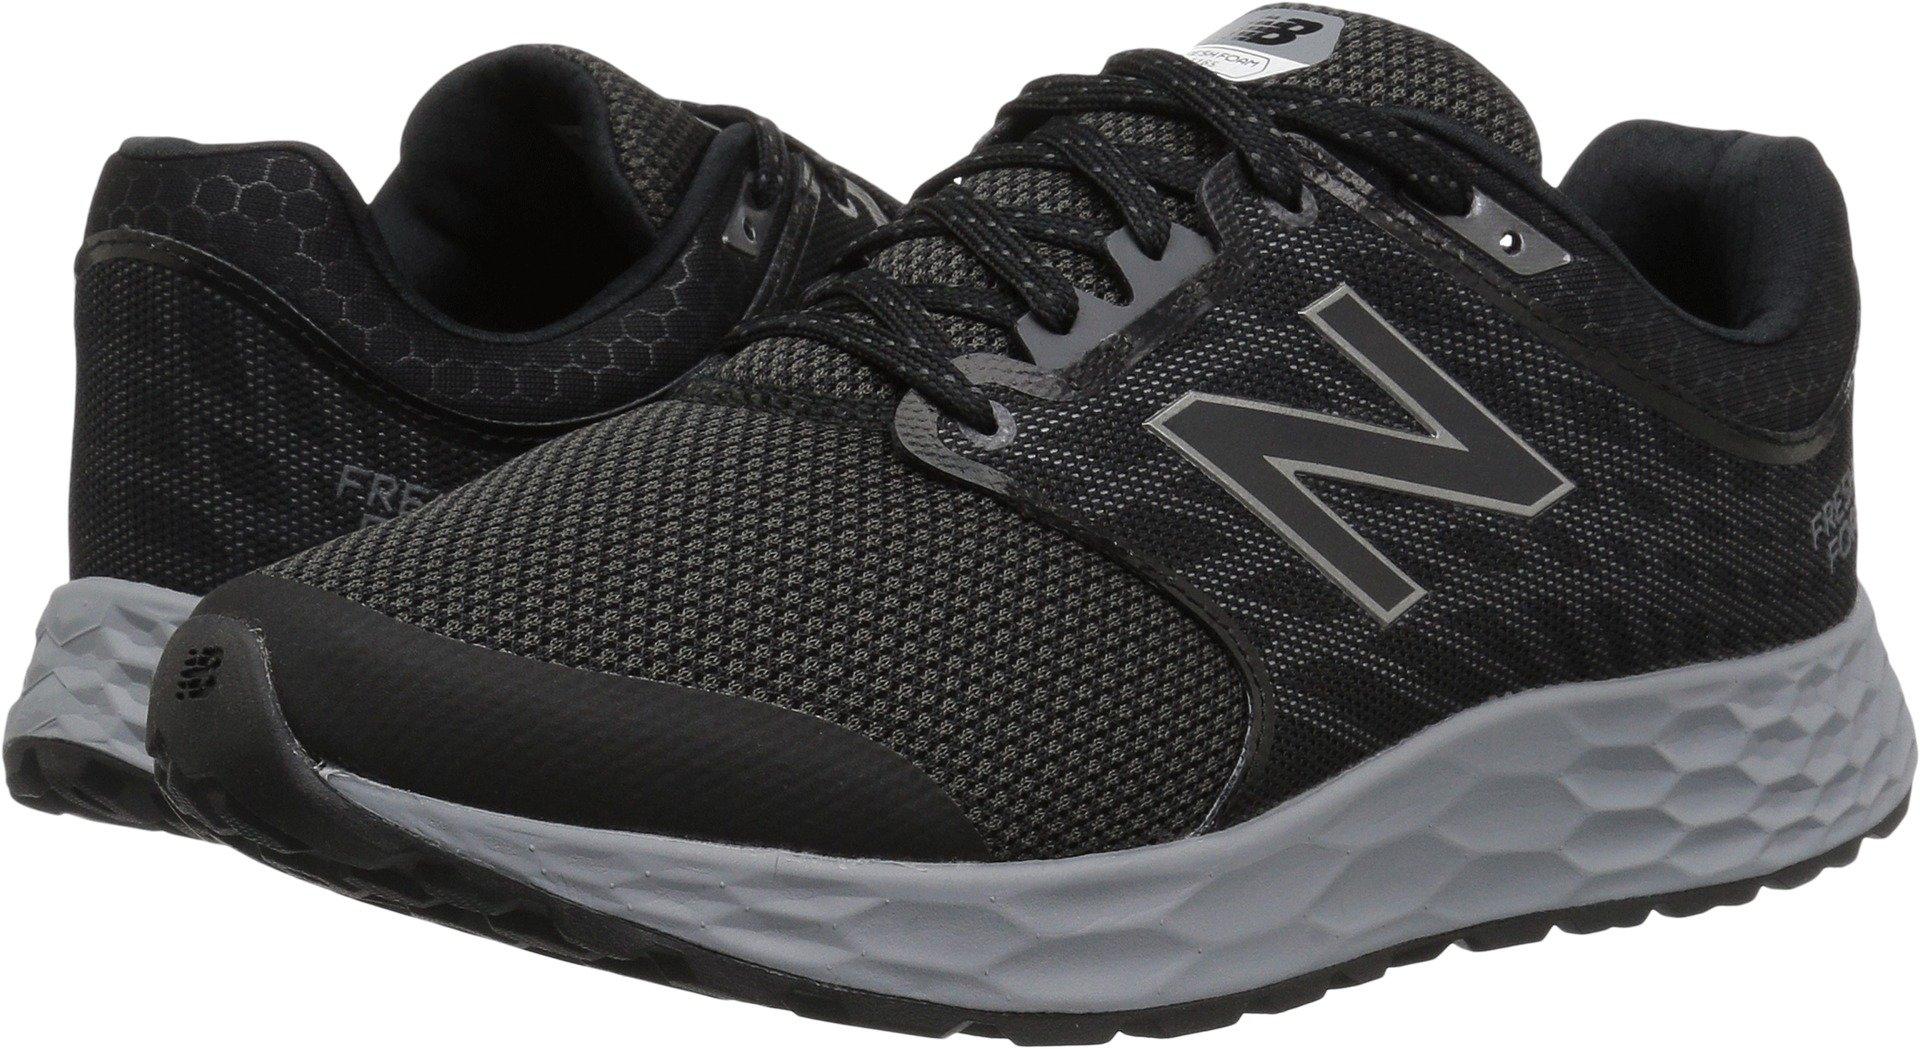 New Balance Men's 1165v1 Fresh Foam Walking Shoe, Black/Silver, 10.5 2E US